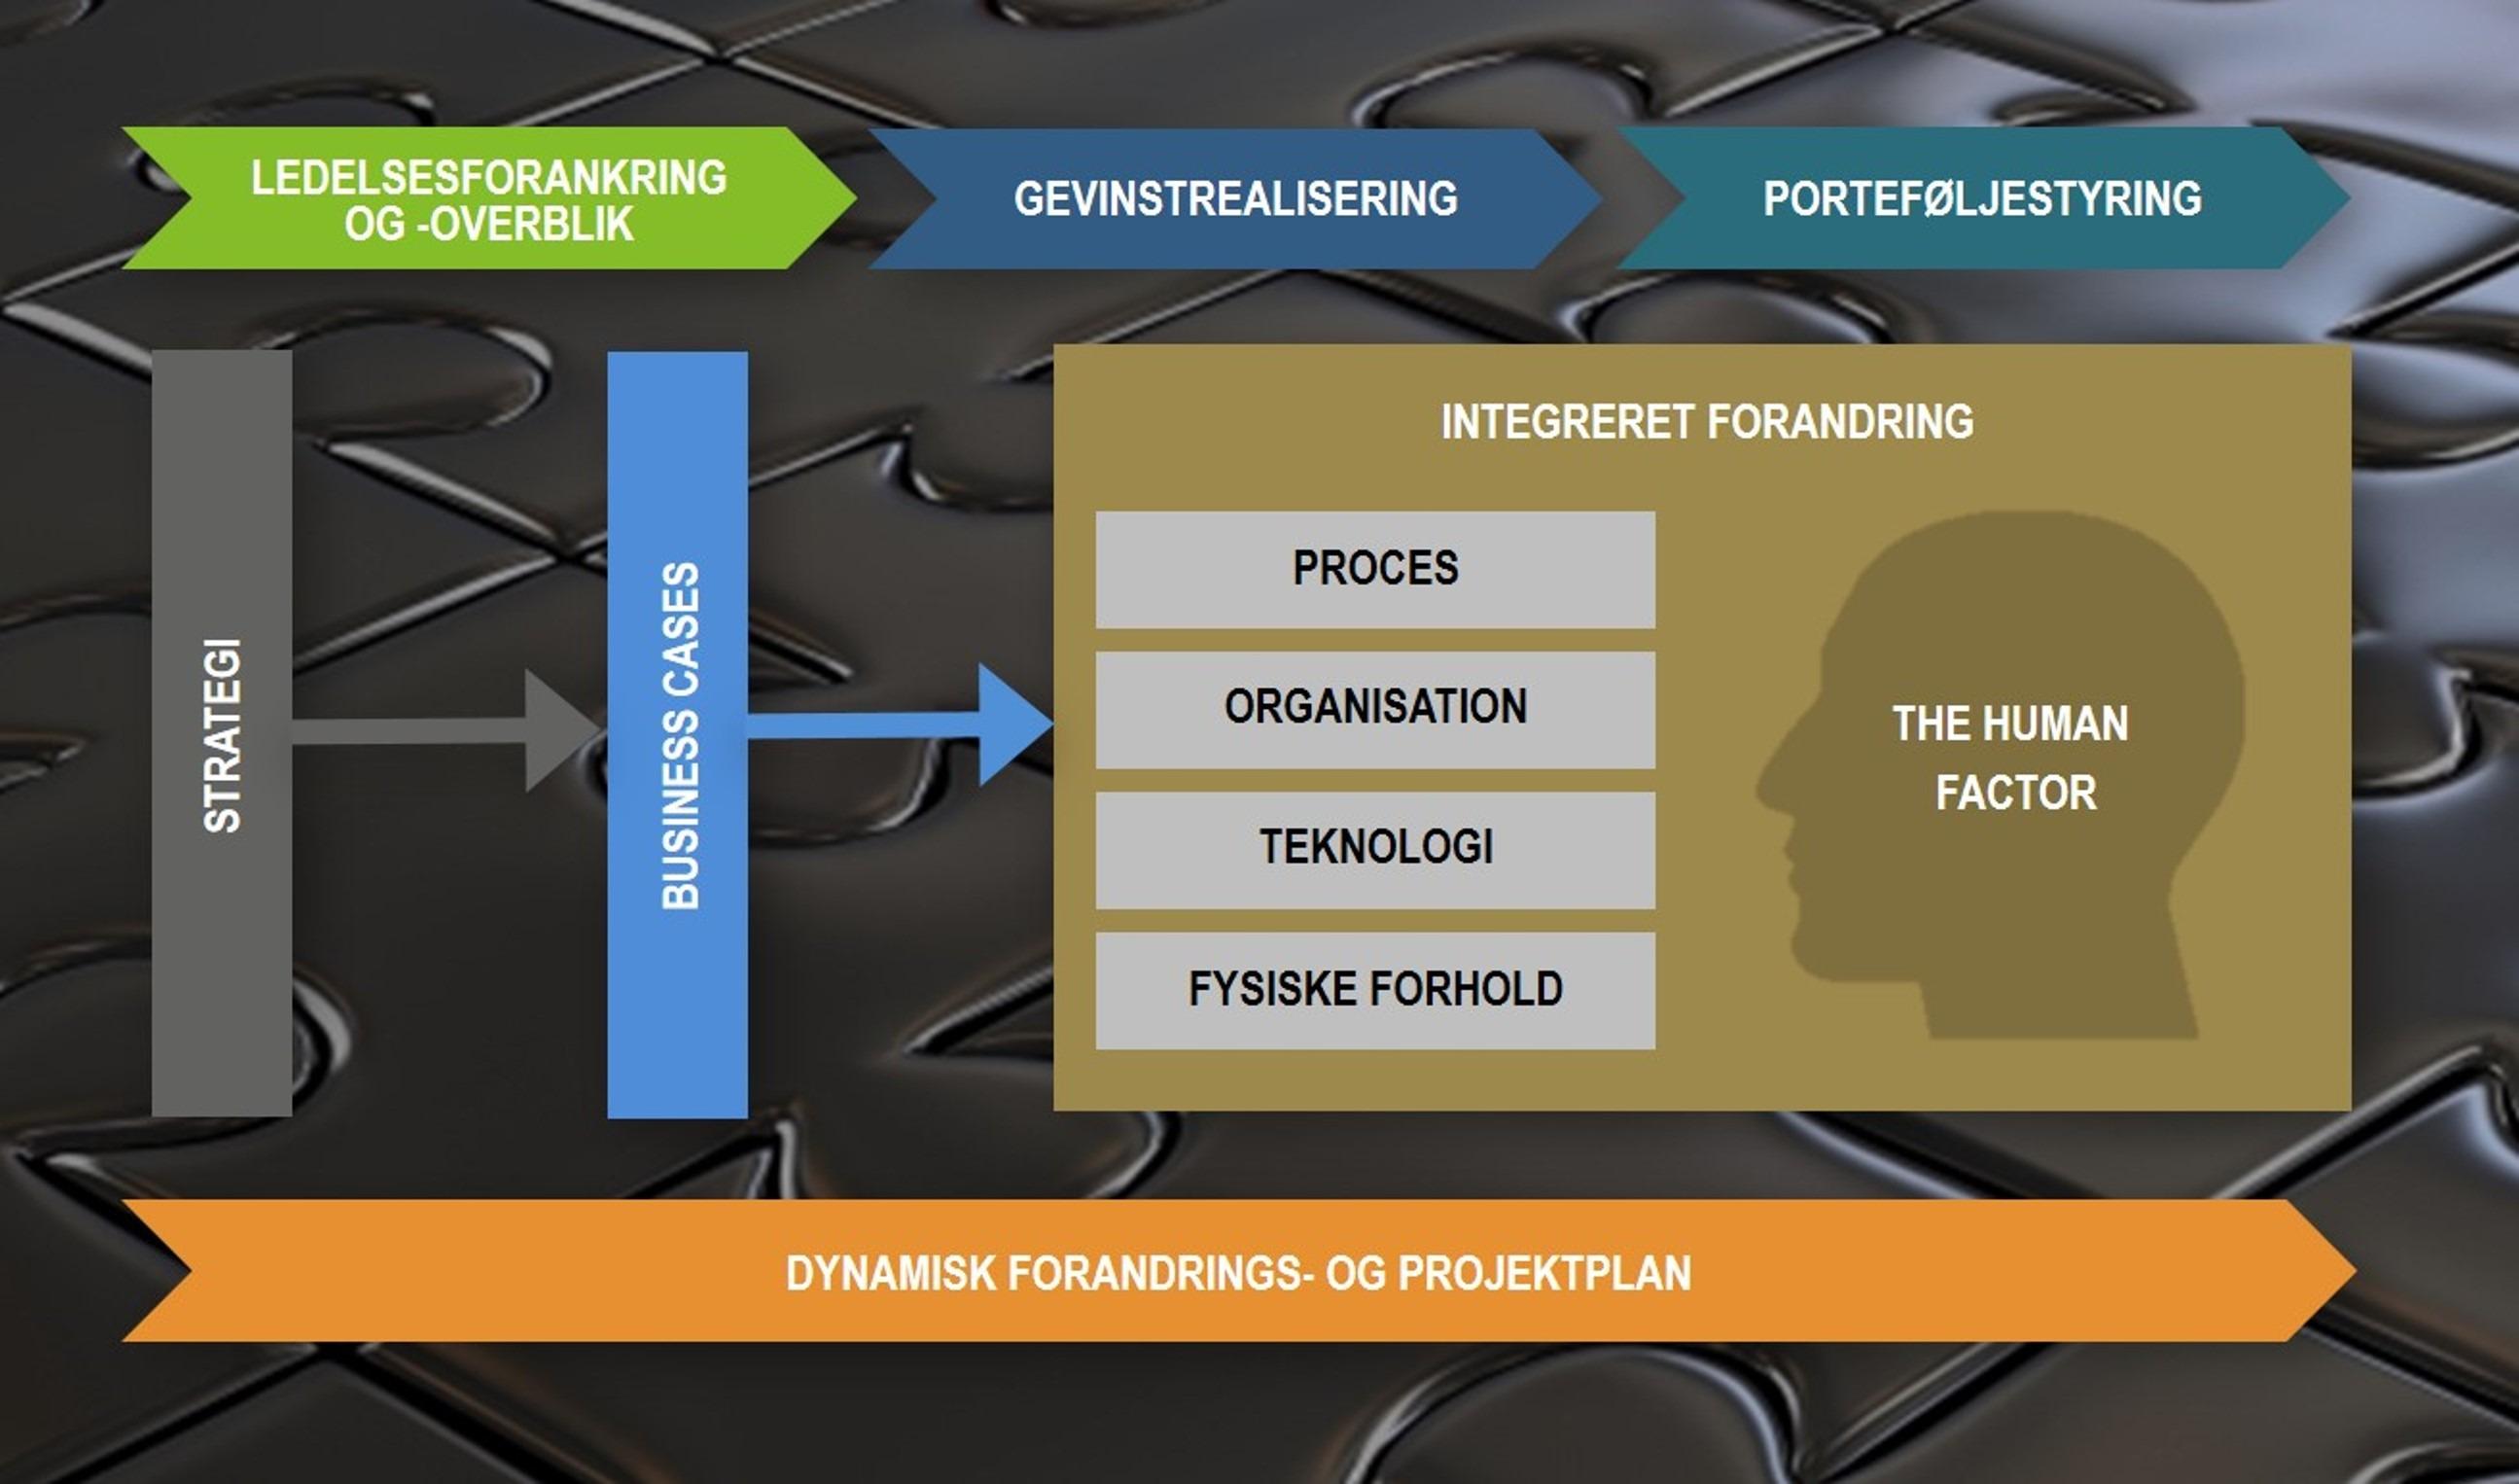 dynamisk forandrings- og projektplan